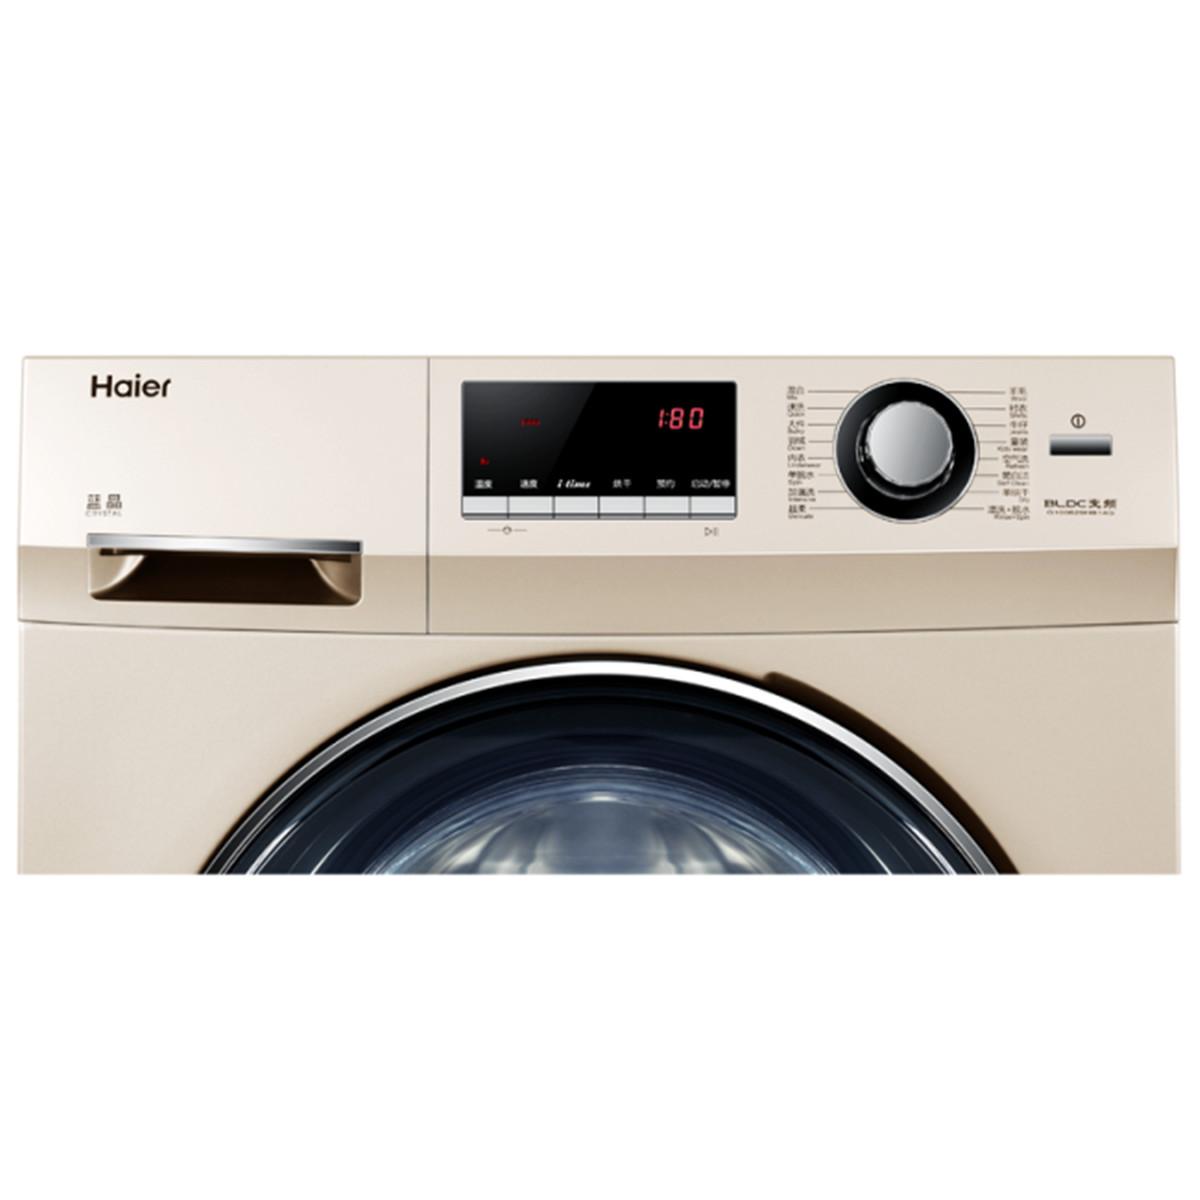 Haier/海尔                         滚筒洗衣机                         G100629HBX14G